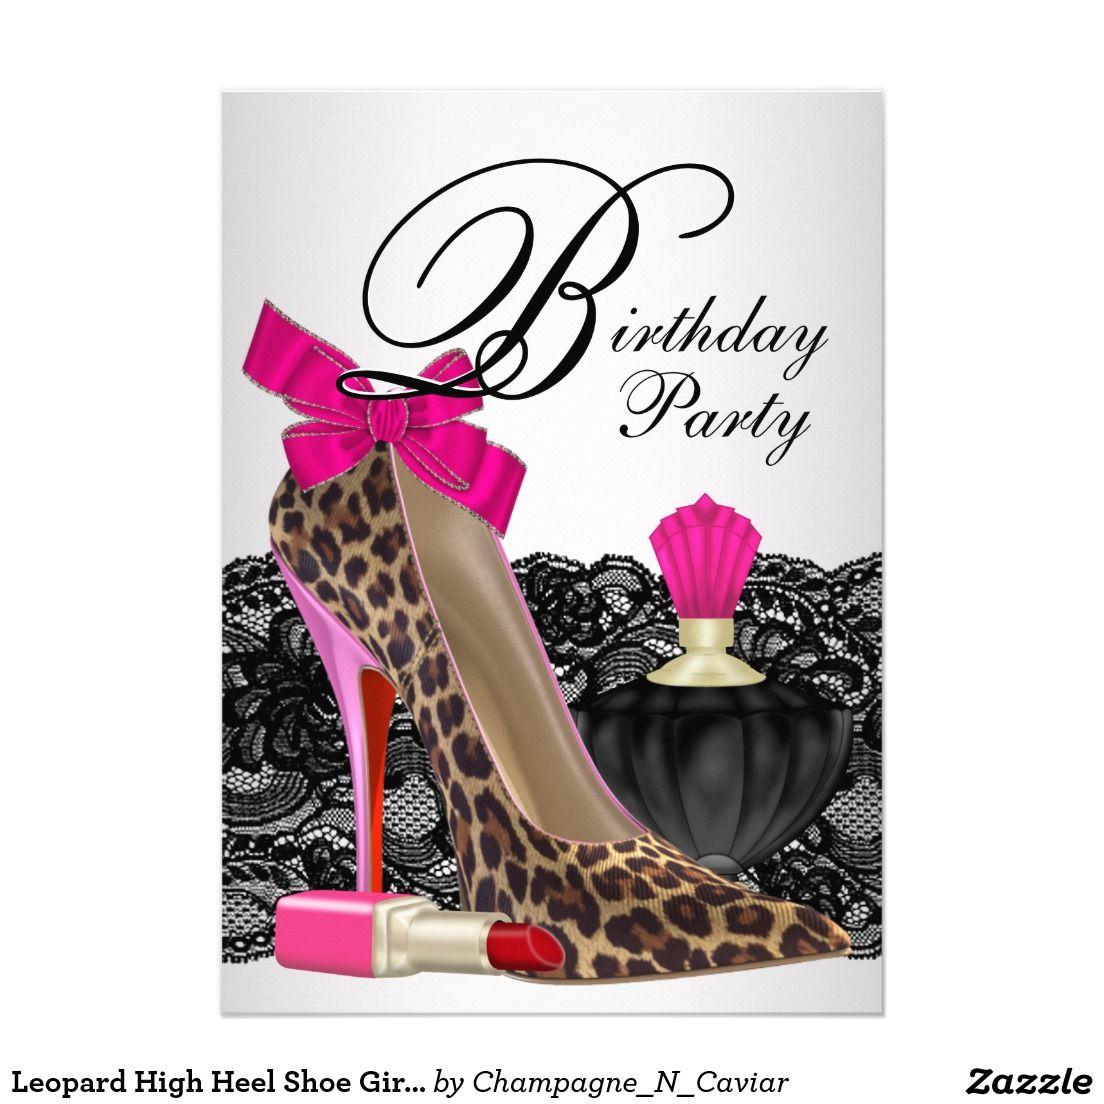 Leopard High Heel Shoe Girly Birthday Party Card | High heel ...